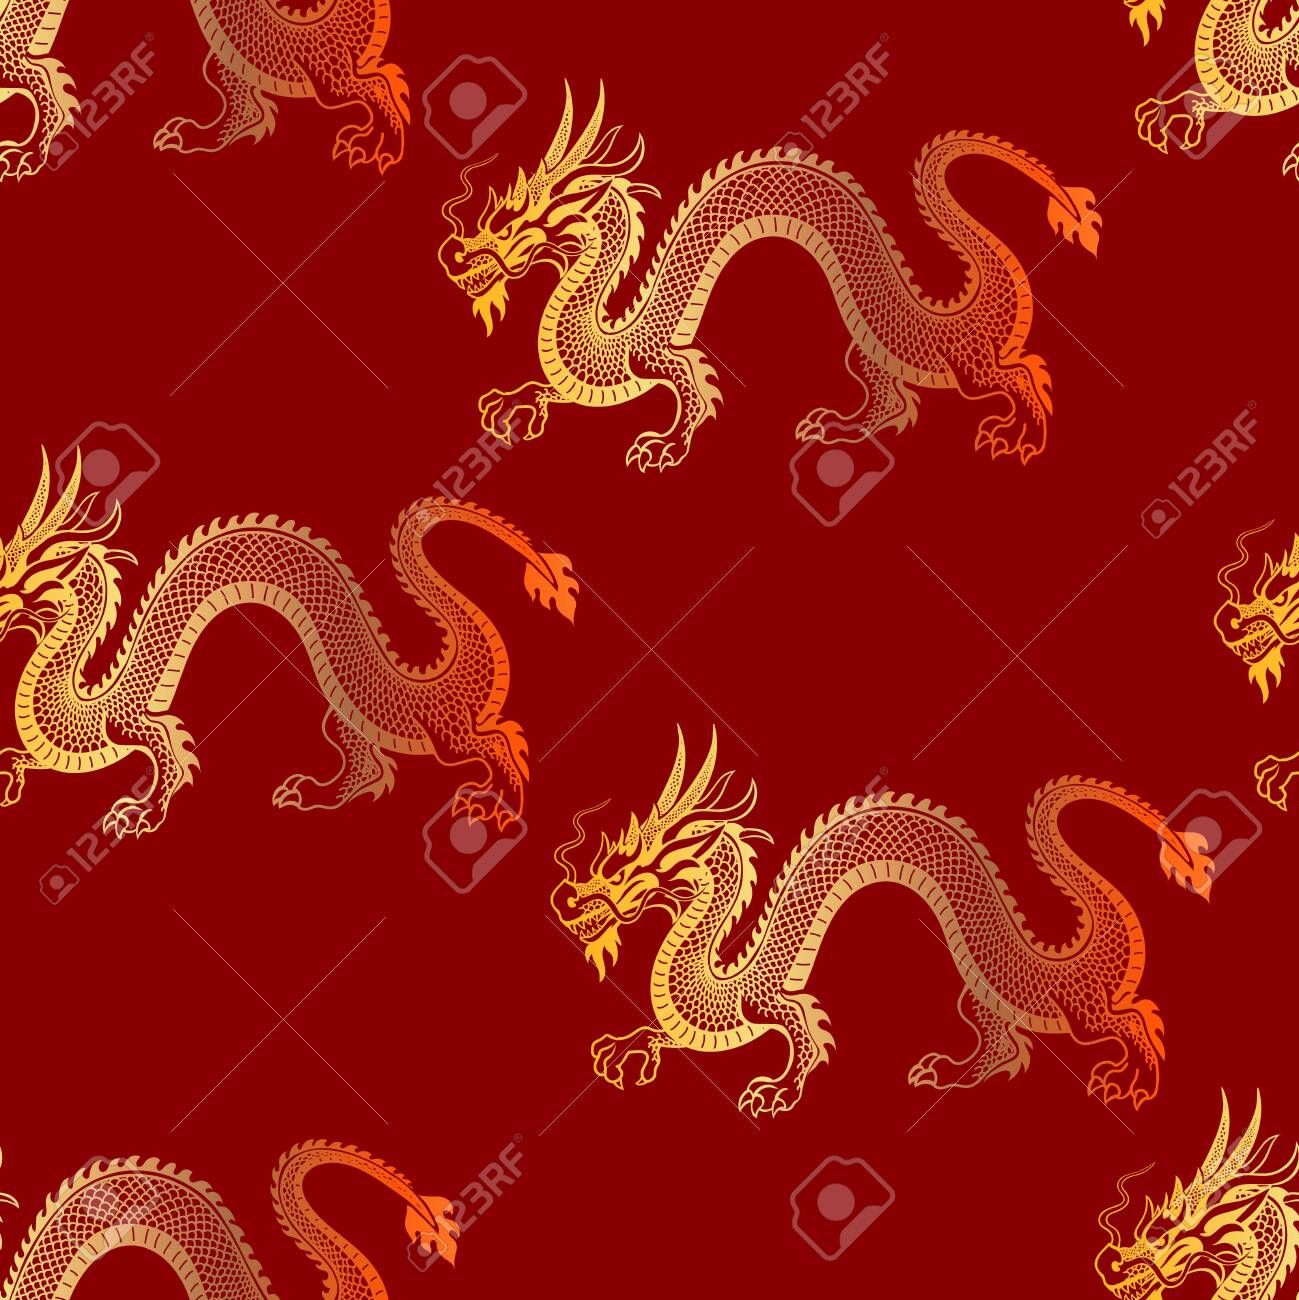 new golden dragon seamless